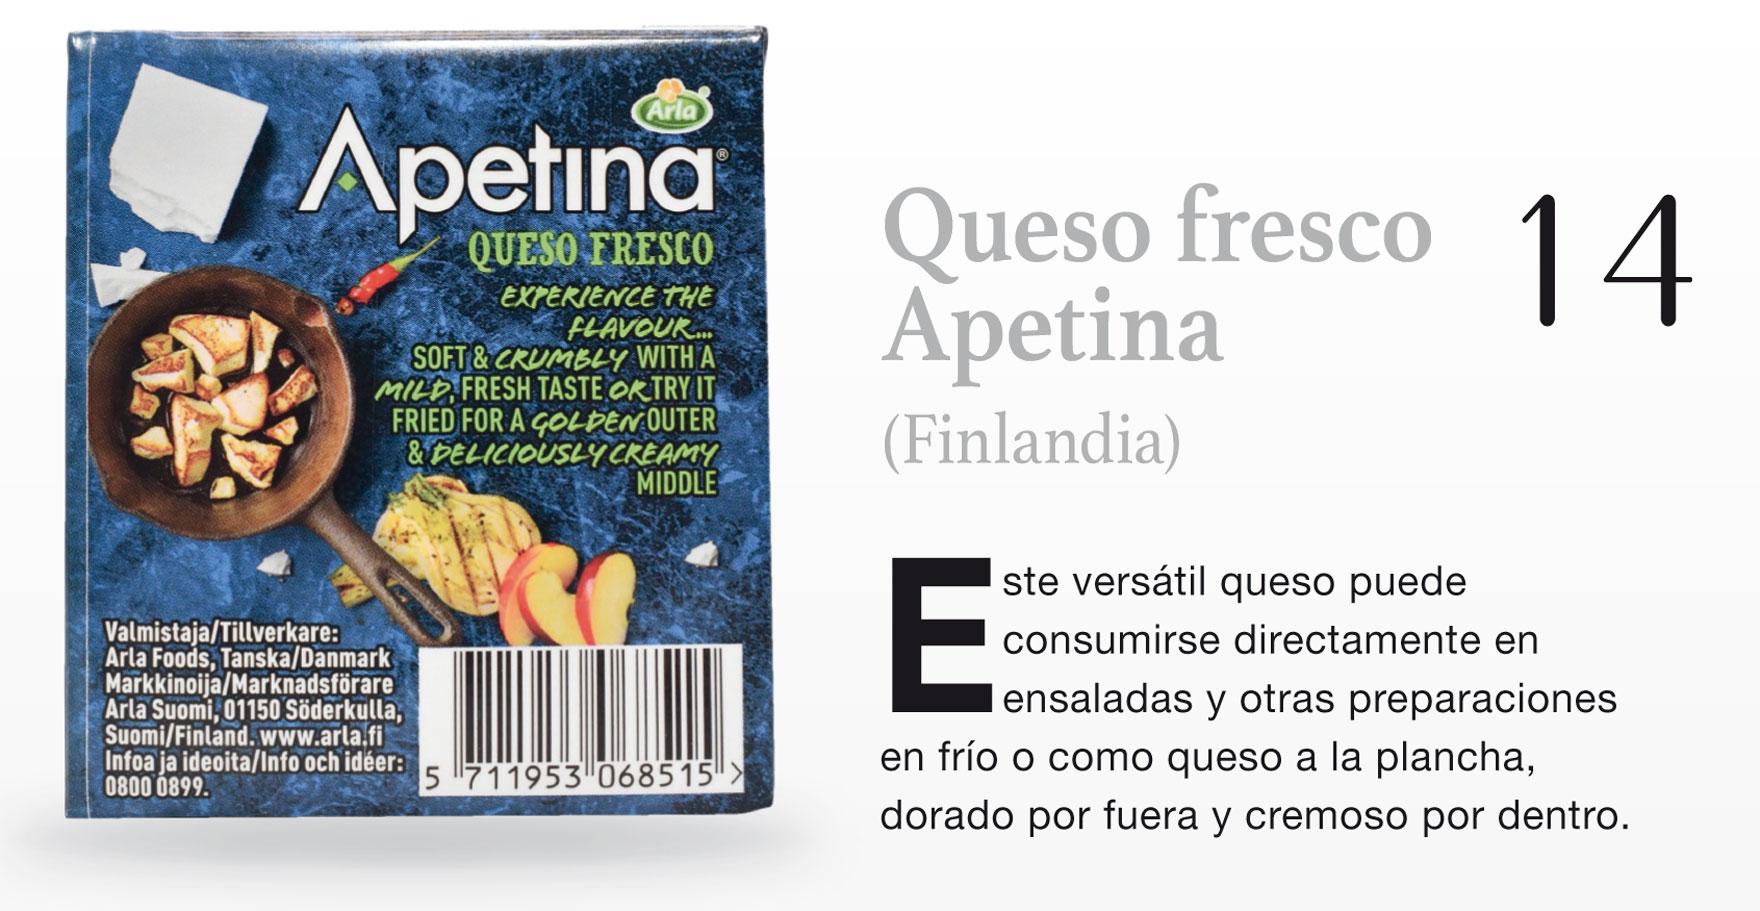 Queso fresco Apetina (Finlandia)